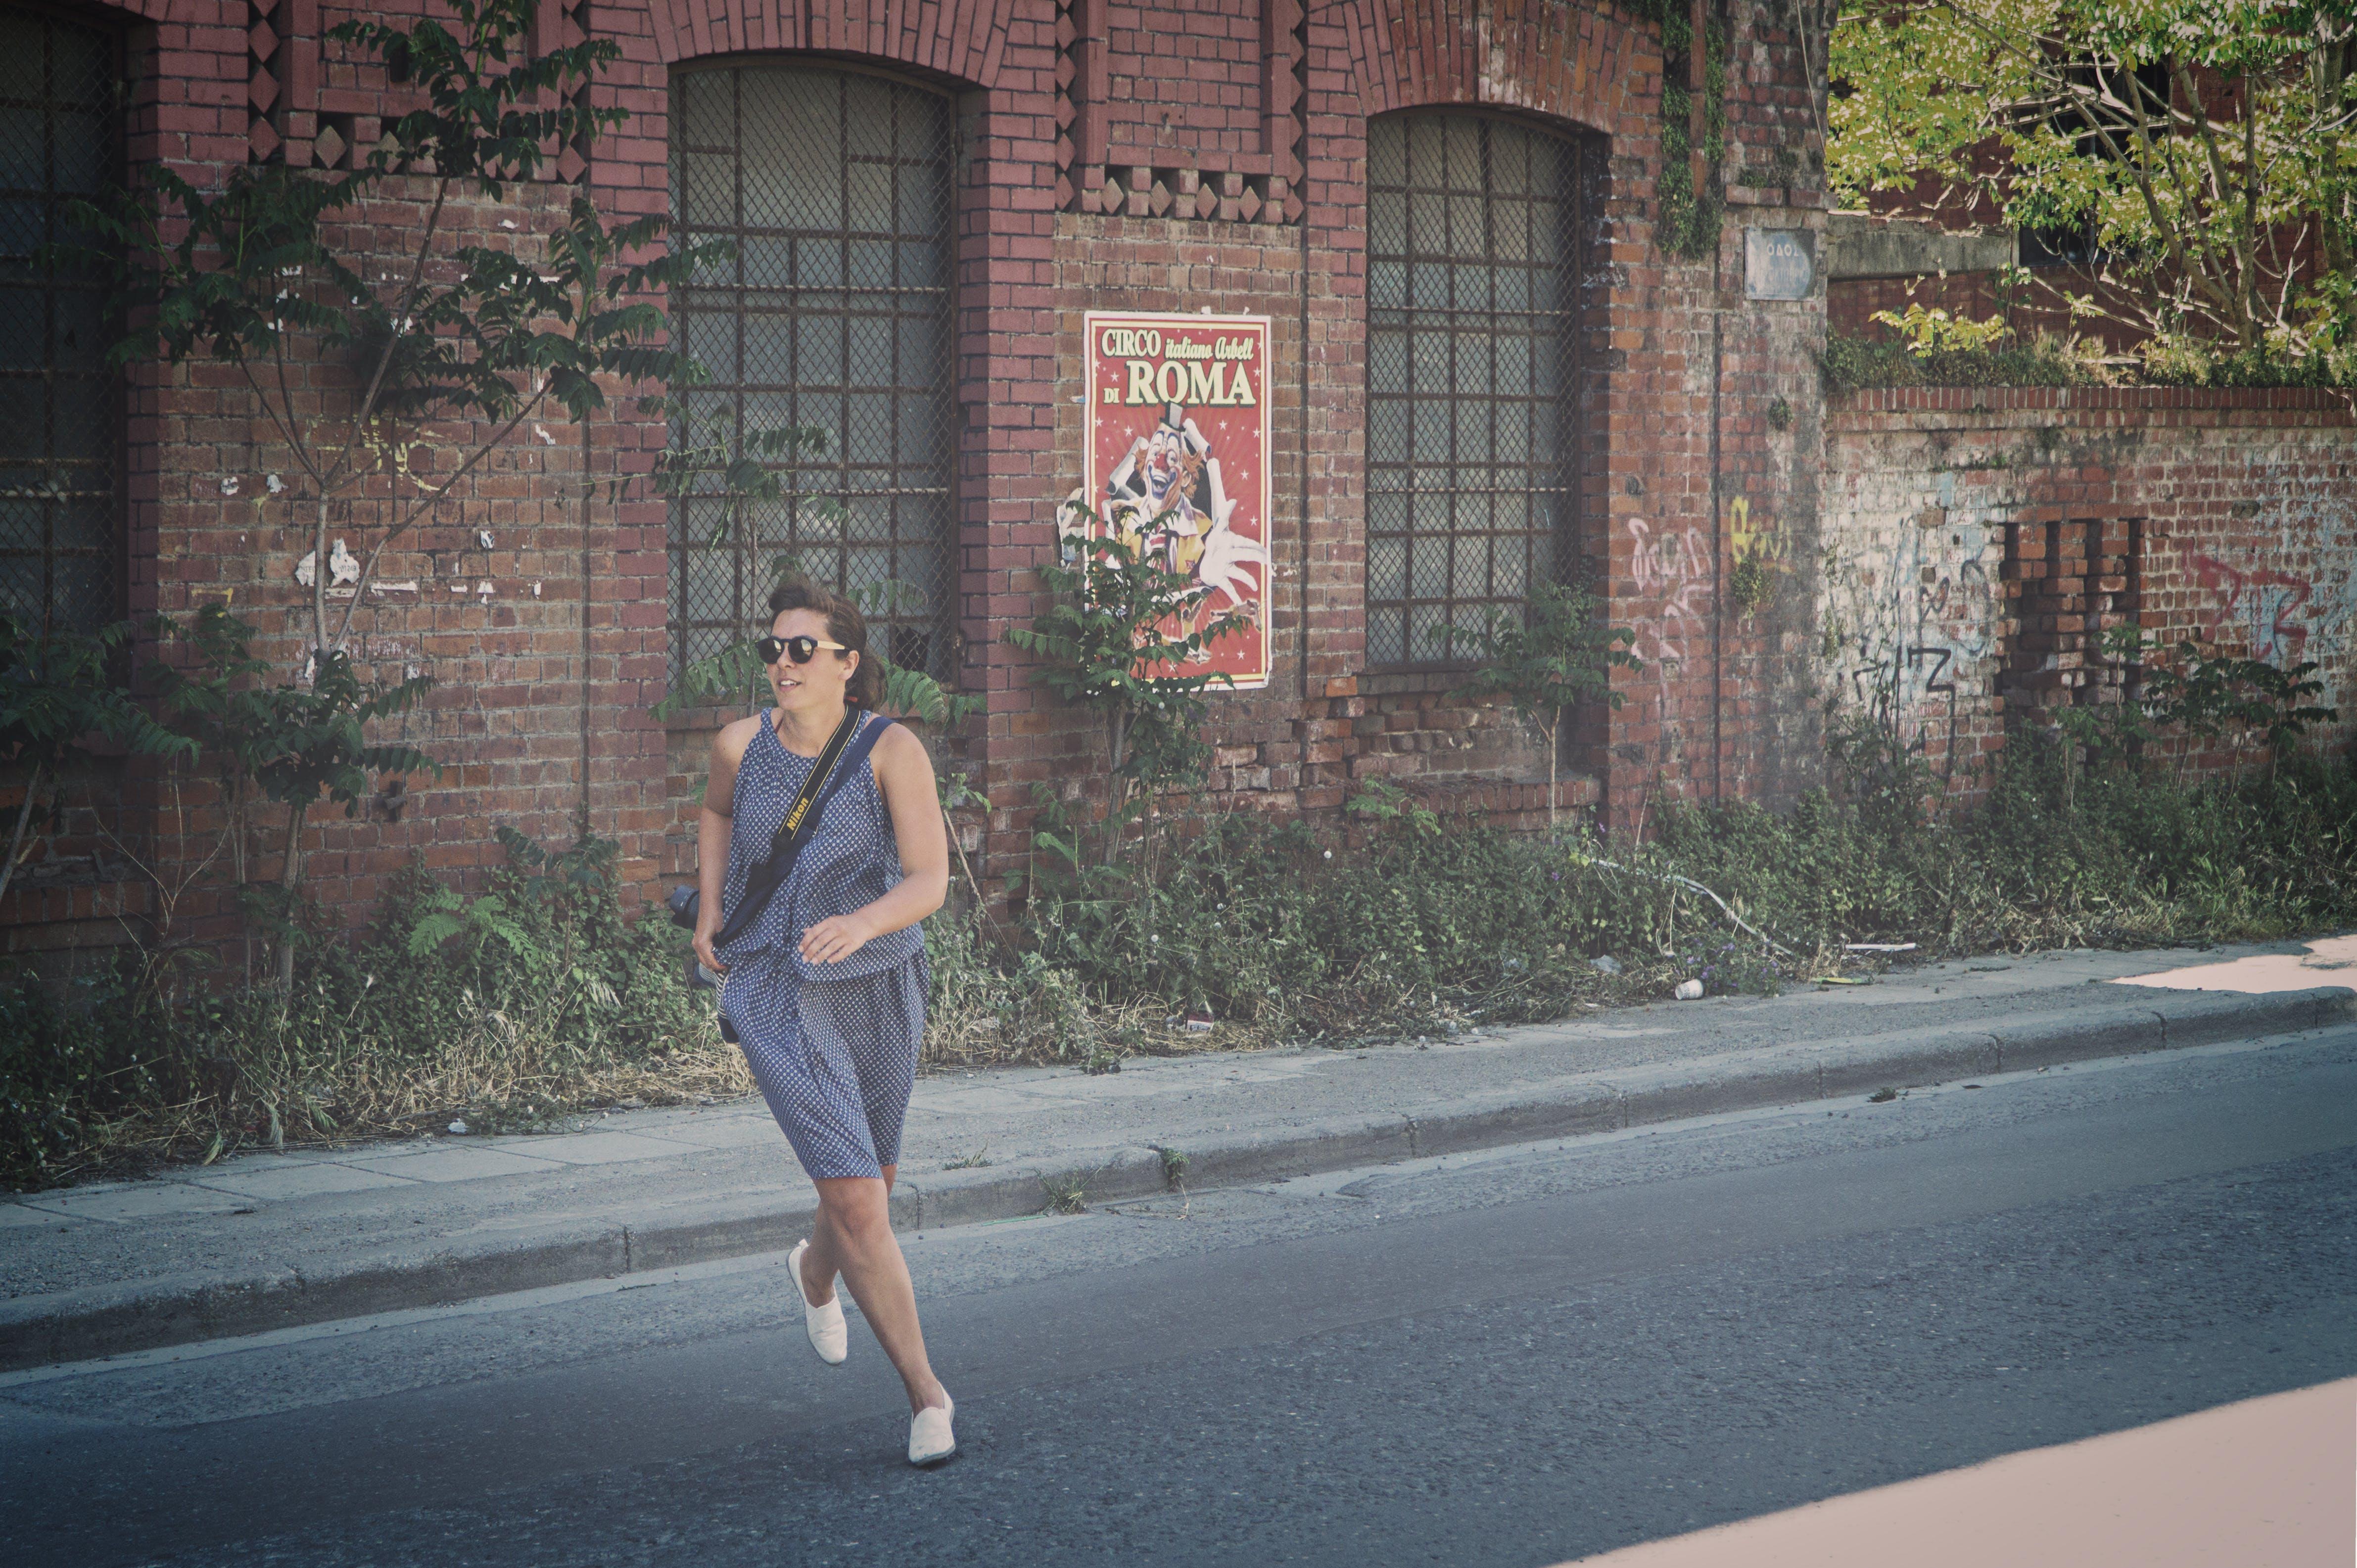 Woman in Blue Tank Dress Running on Road